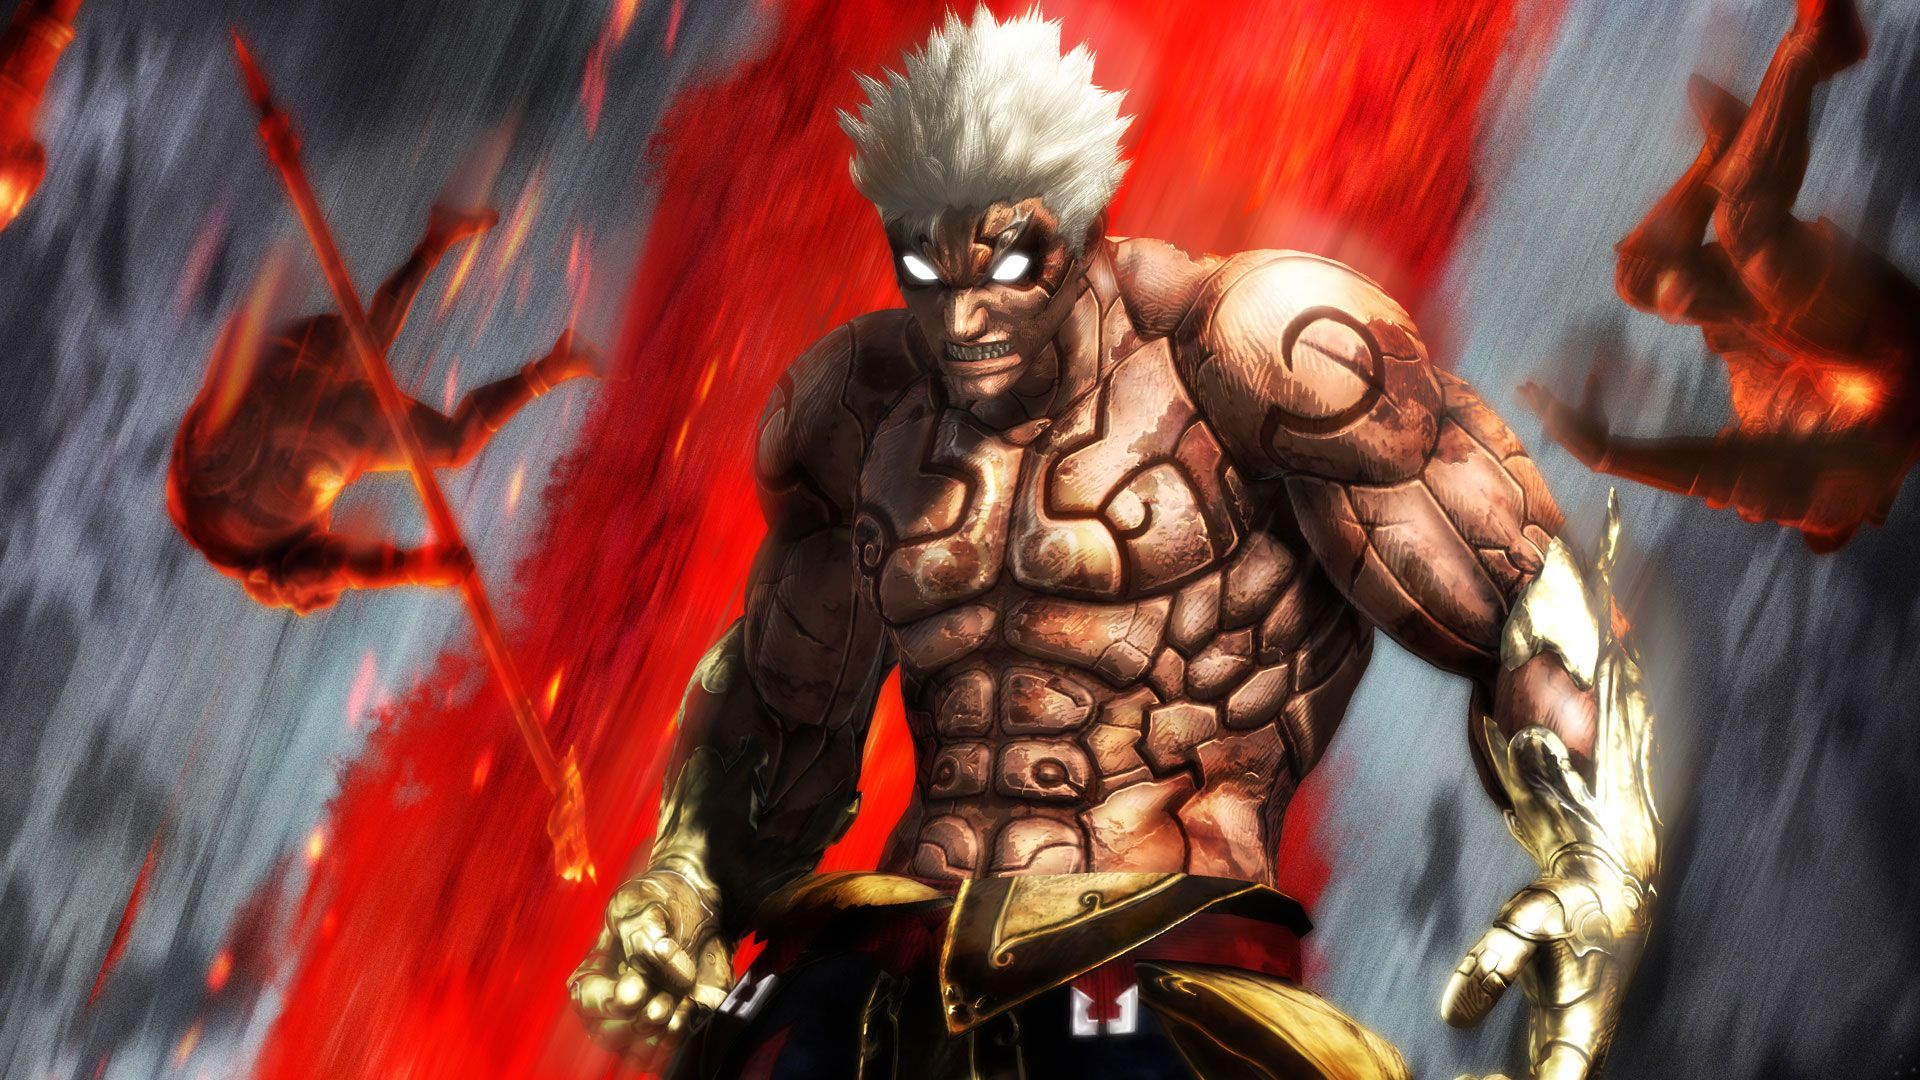 Asuras Wrath Asura Vs Yasha Wallpaper Hd Wallpaper Jeux Video Asura S Wrath Dark Souls 2 Wrath